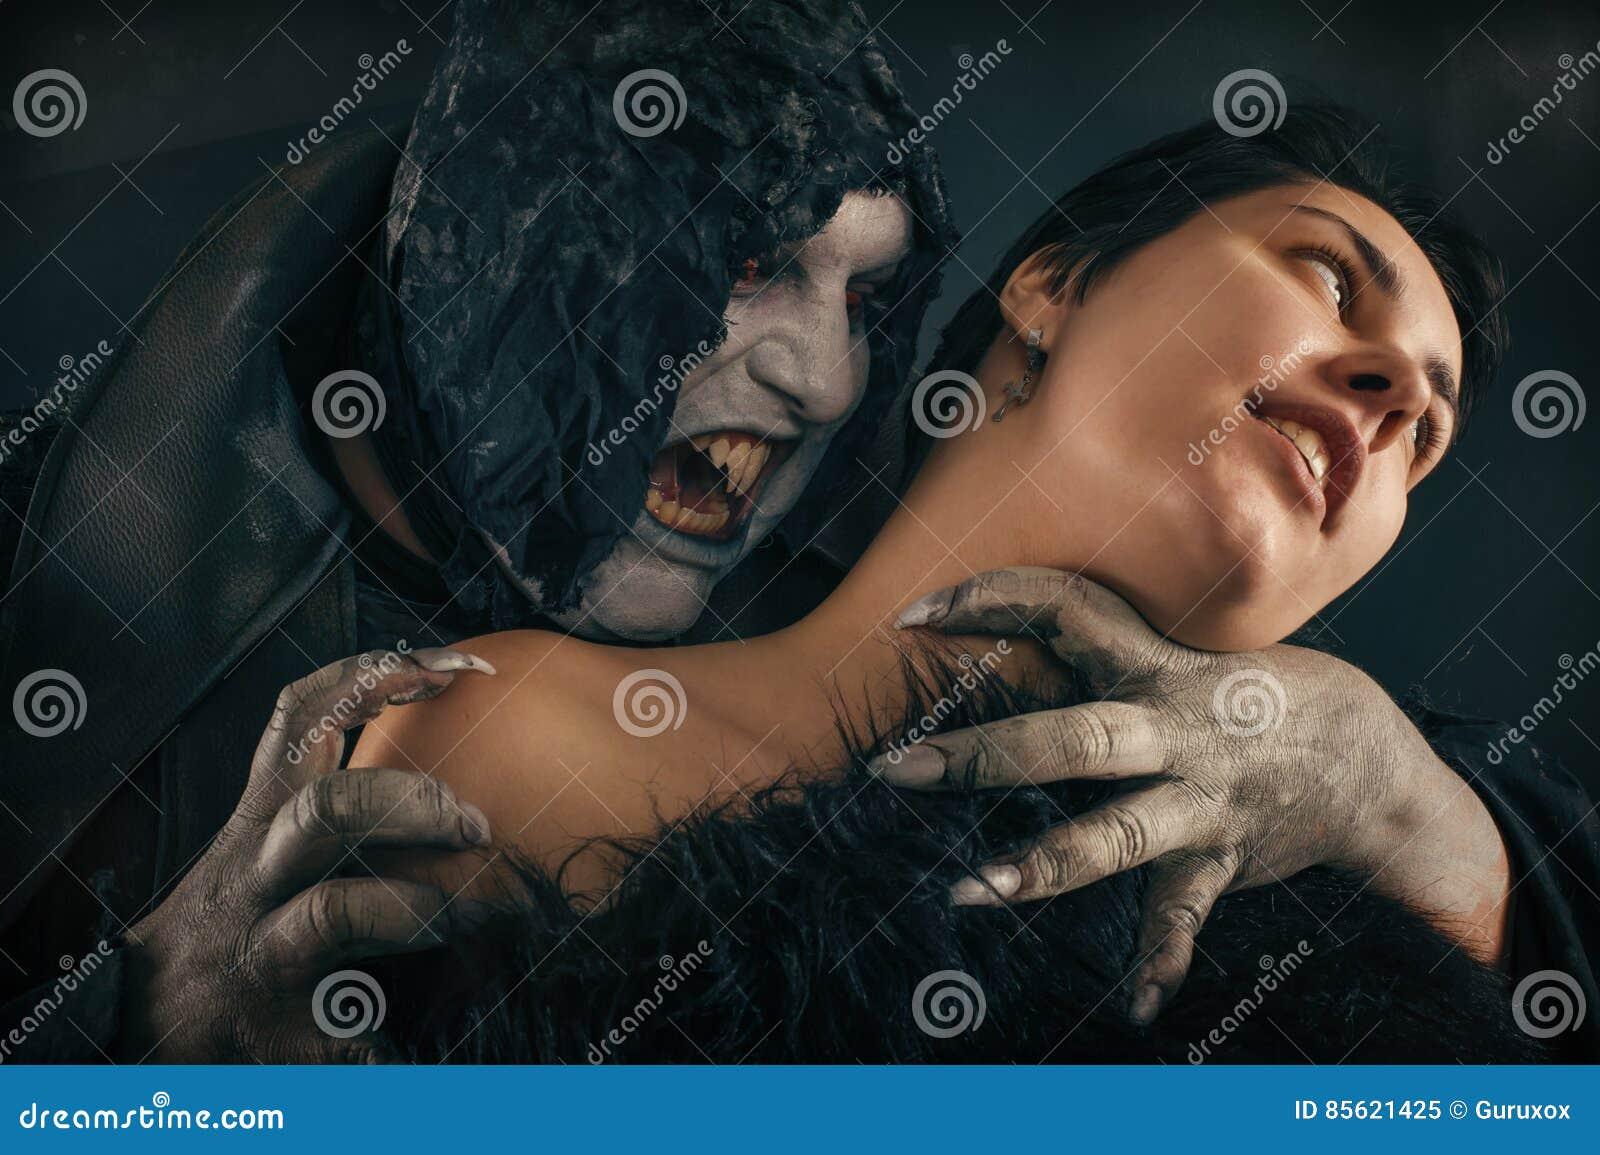 Jovem mulher cortante do diabo assustador do vampiro Nightmar gótico medieval